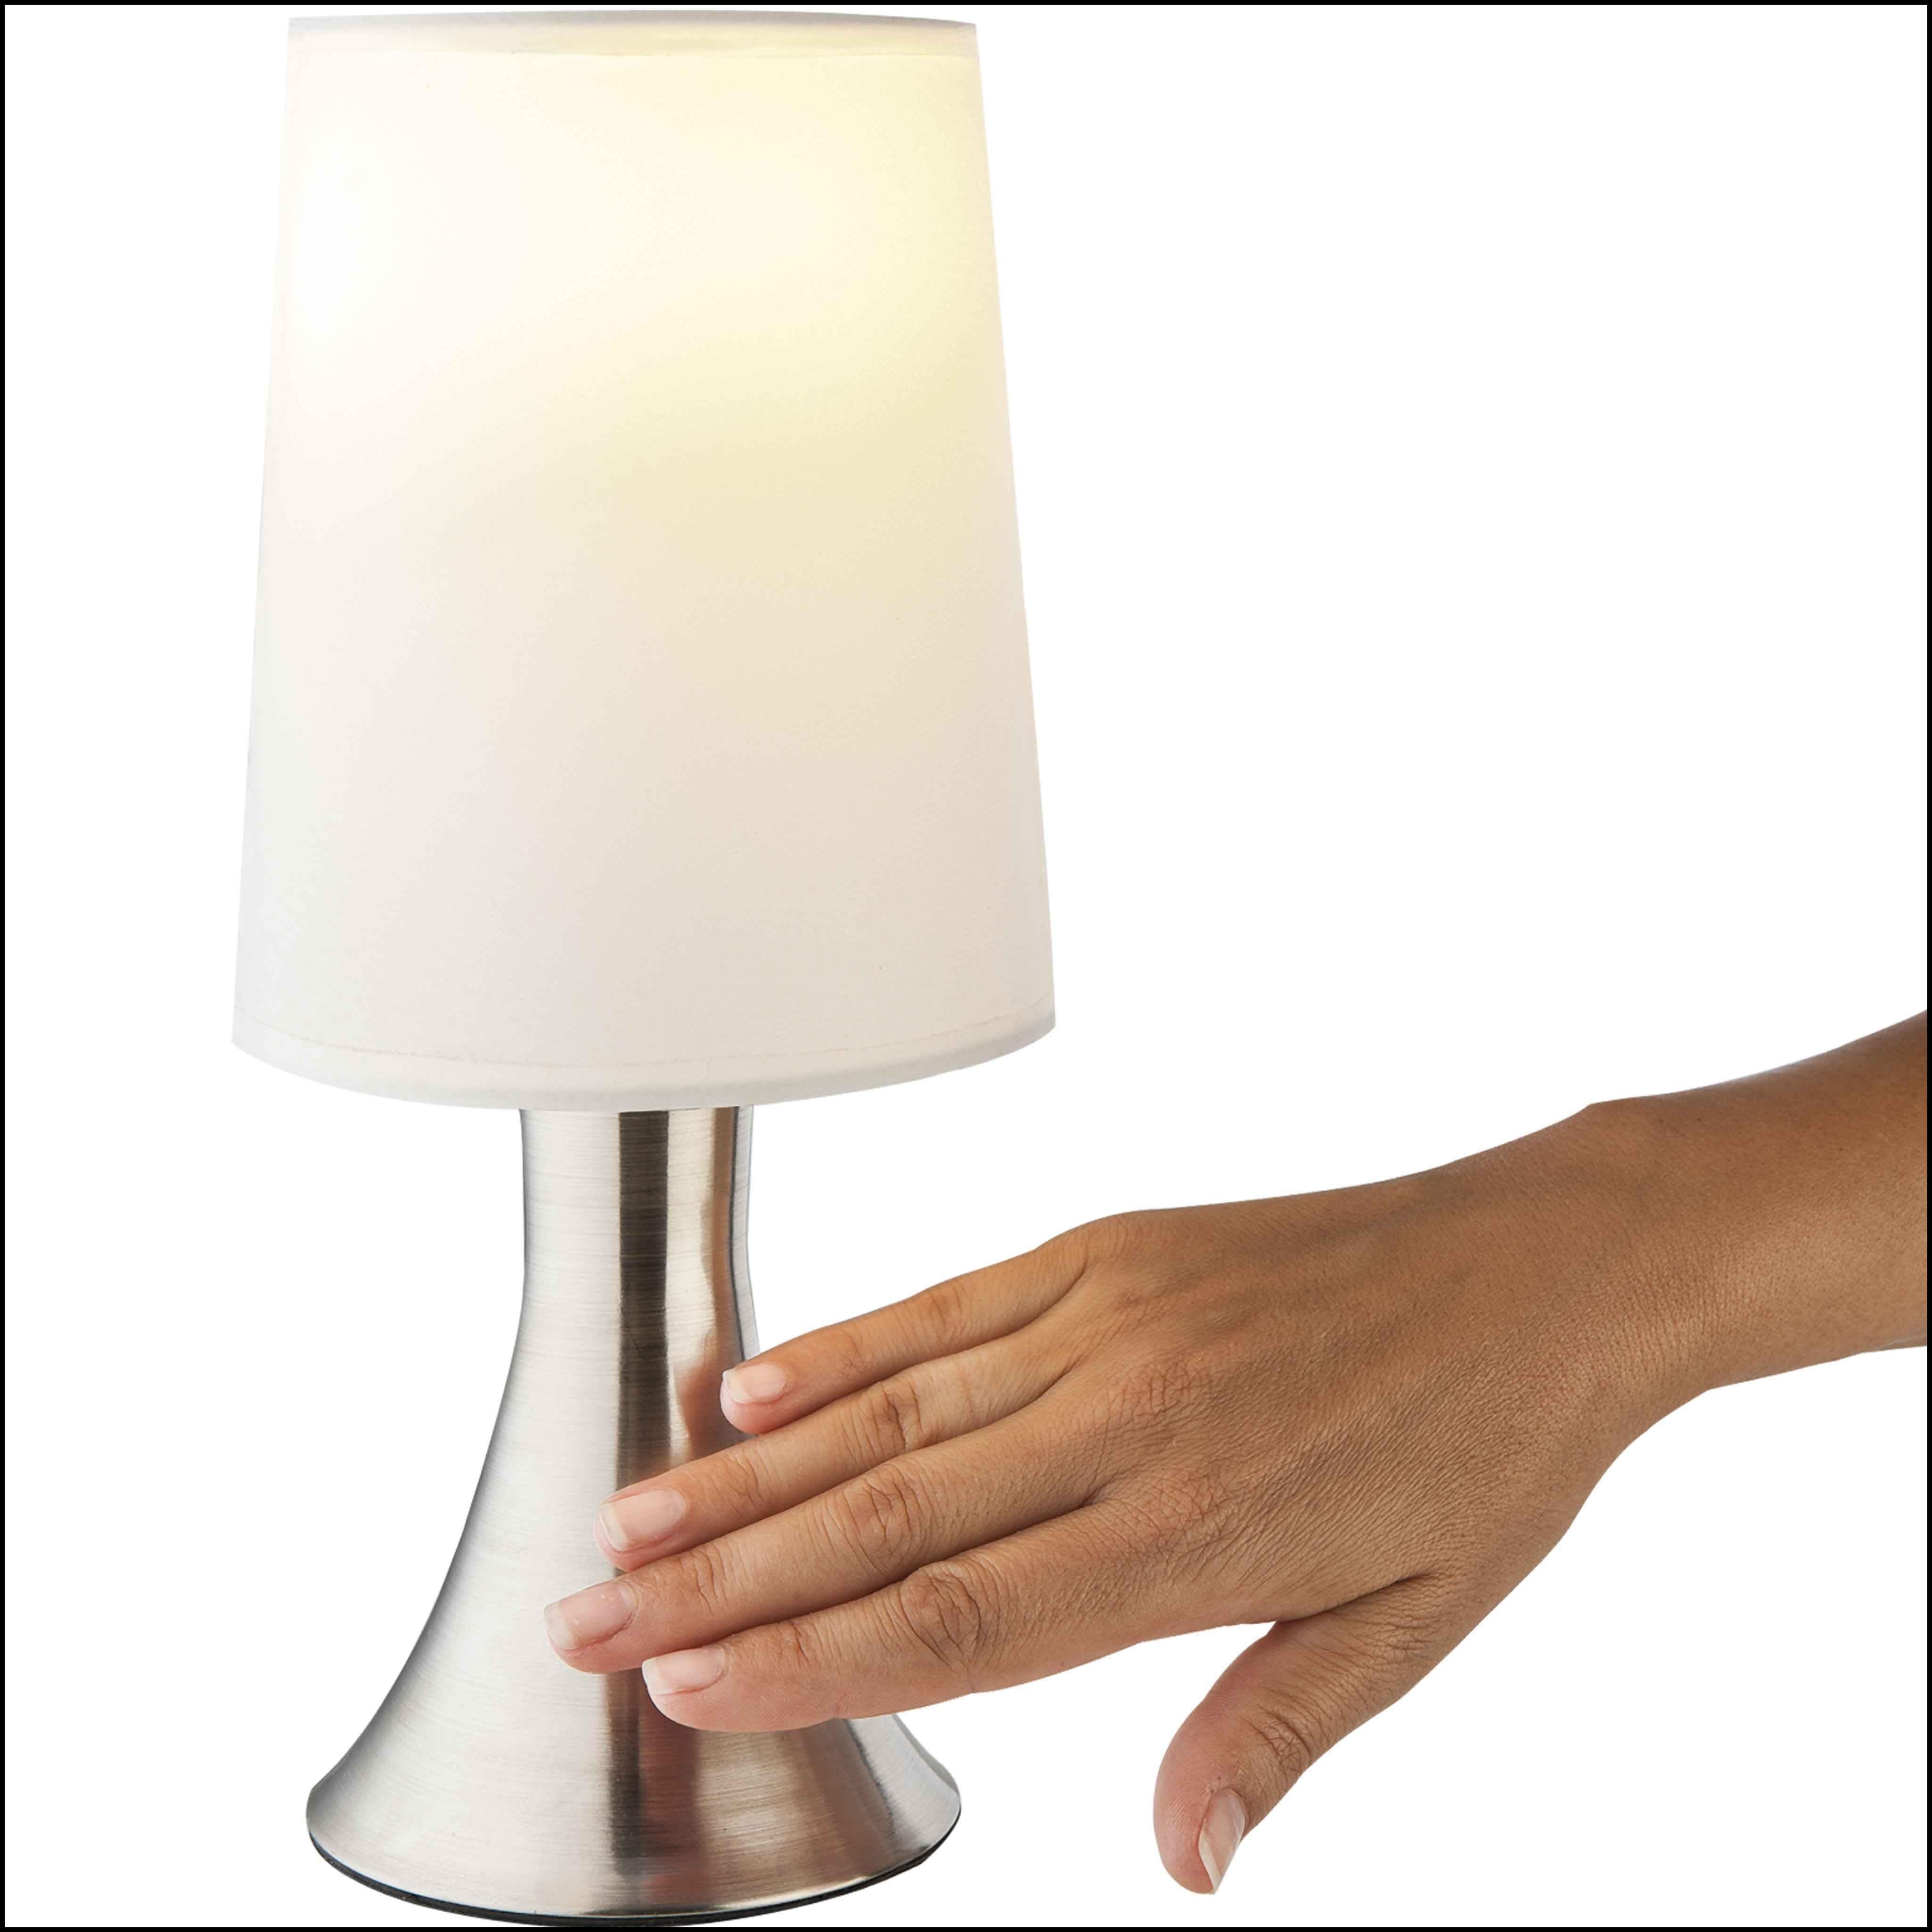 Bizzard Luminaire Idée De Iuwtopzkx Et Chevet Maison Lampe UVzMpqS